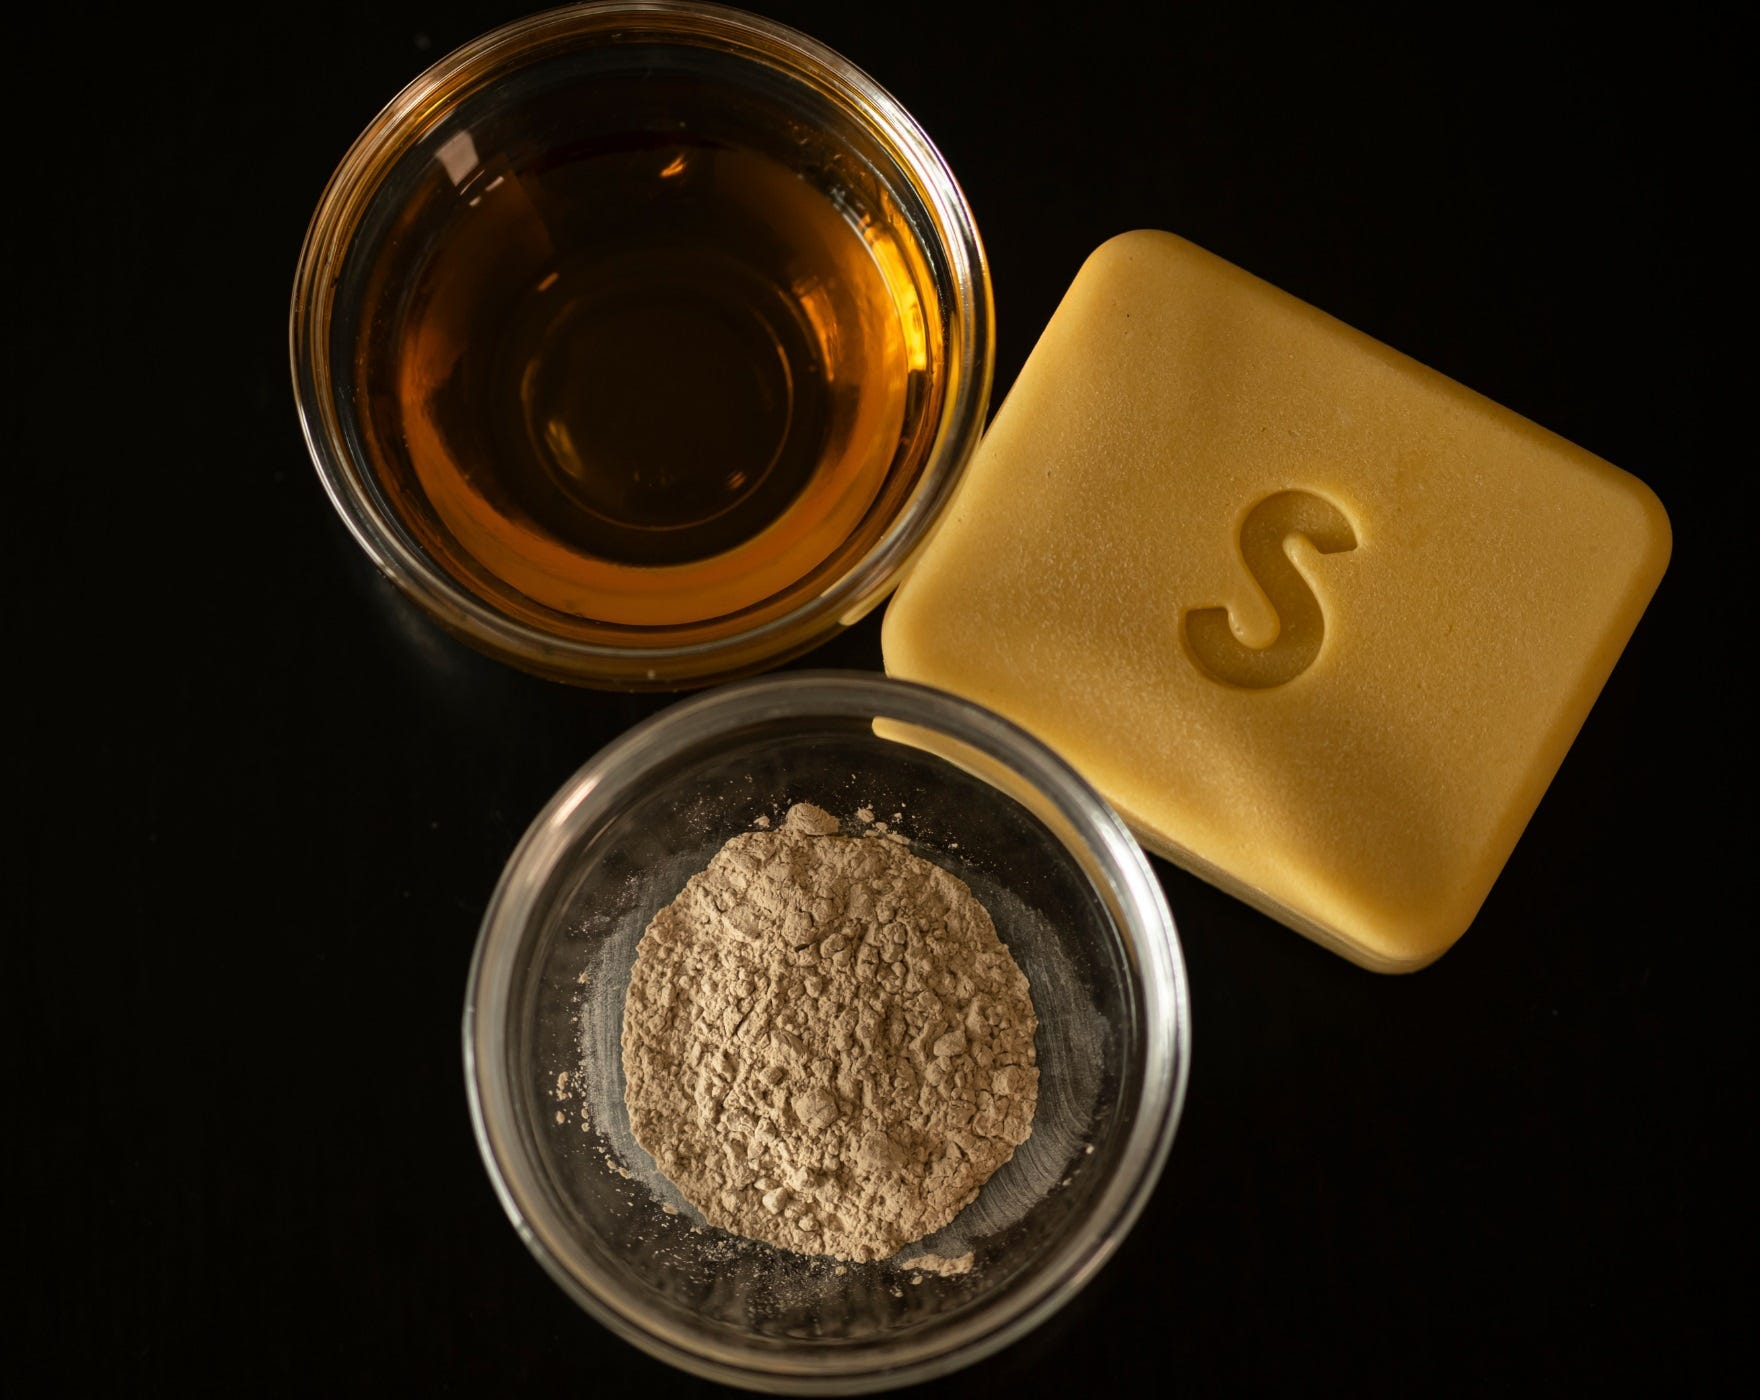 Nuebar Soap Ingredients